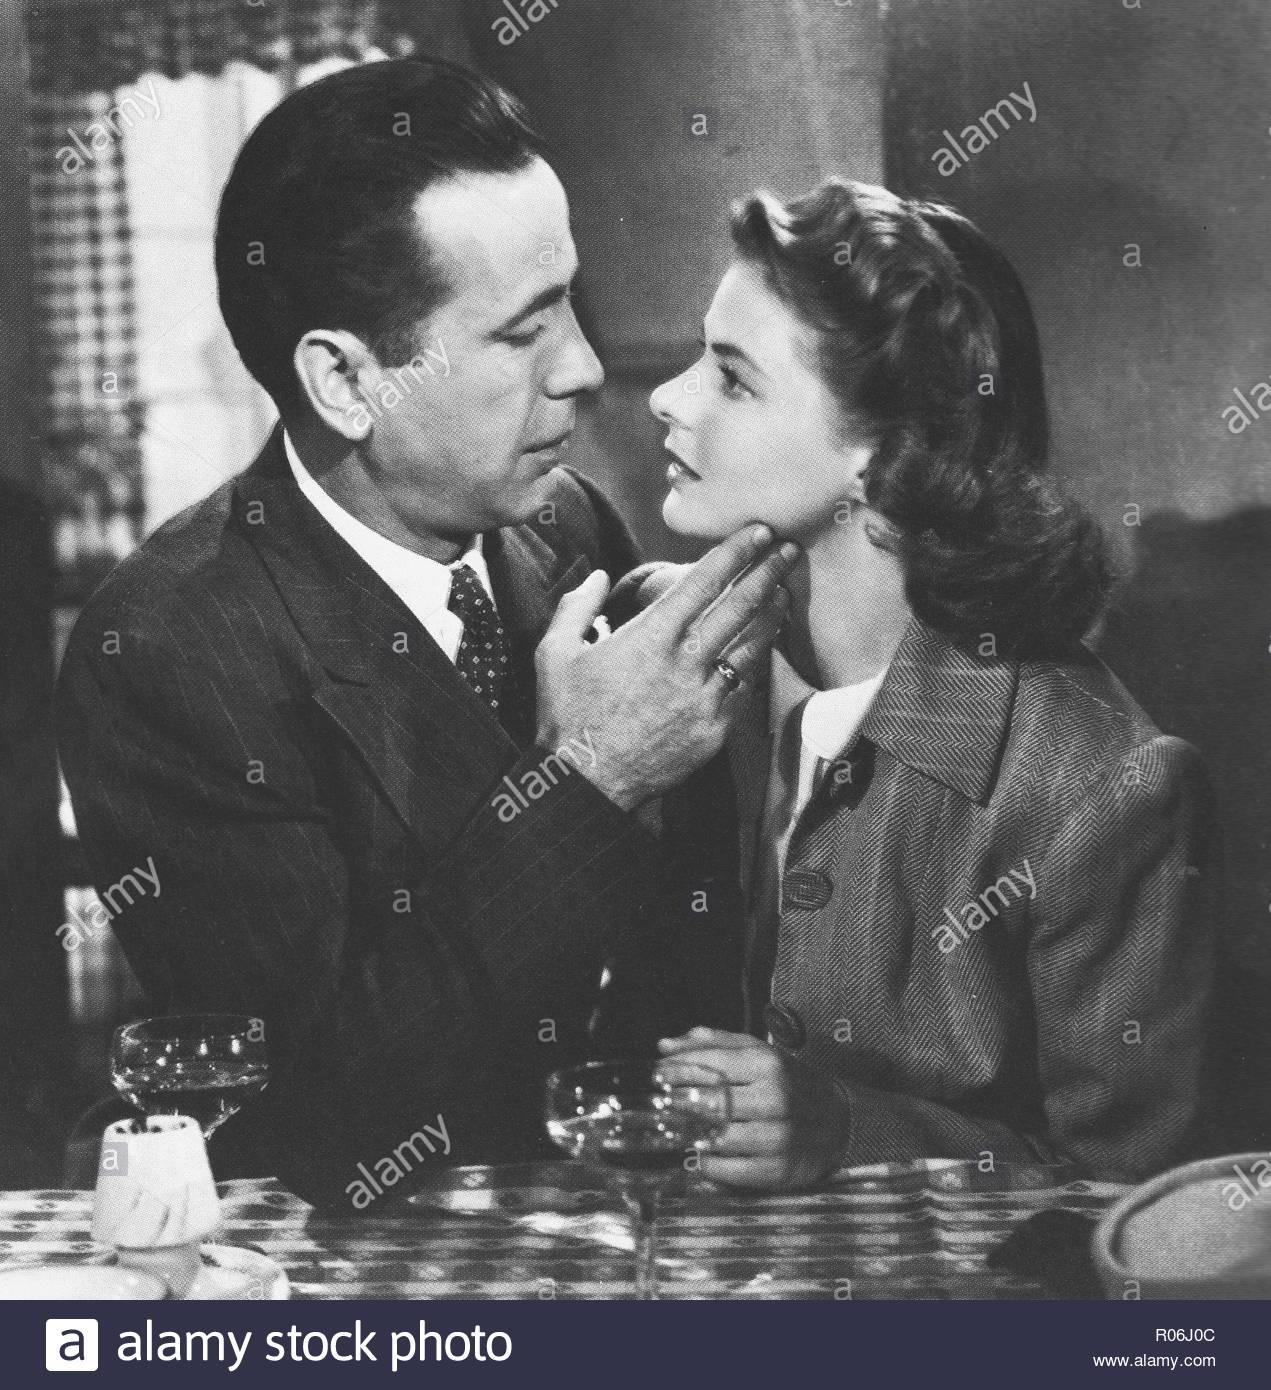 Humphrey Bogart and Ingrid Bergman in a publicity photo for Casablanca, 1942 American film. With Paul Henreid, Conrad Veidt. Claude Rains, Peter Lorre. Here's looking at you, kid. - Stock Image